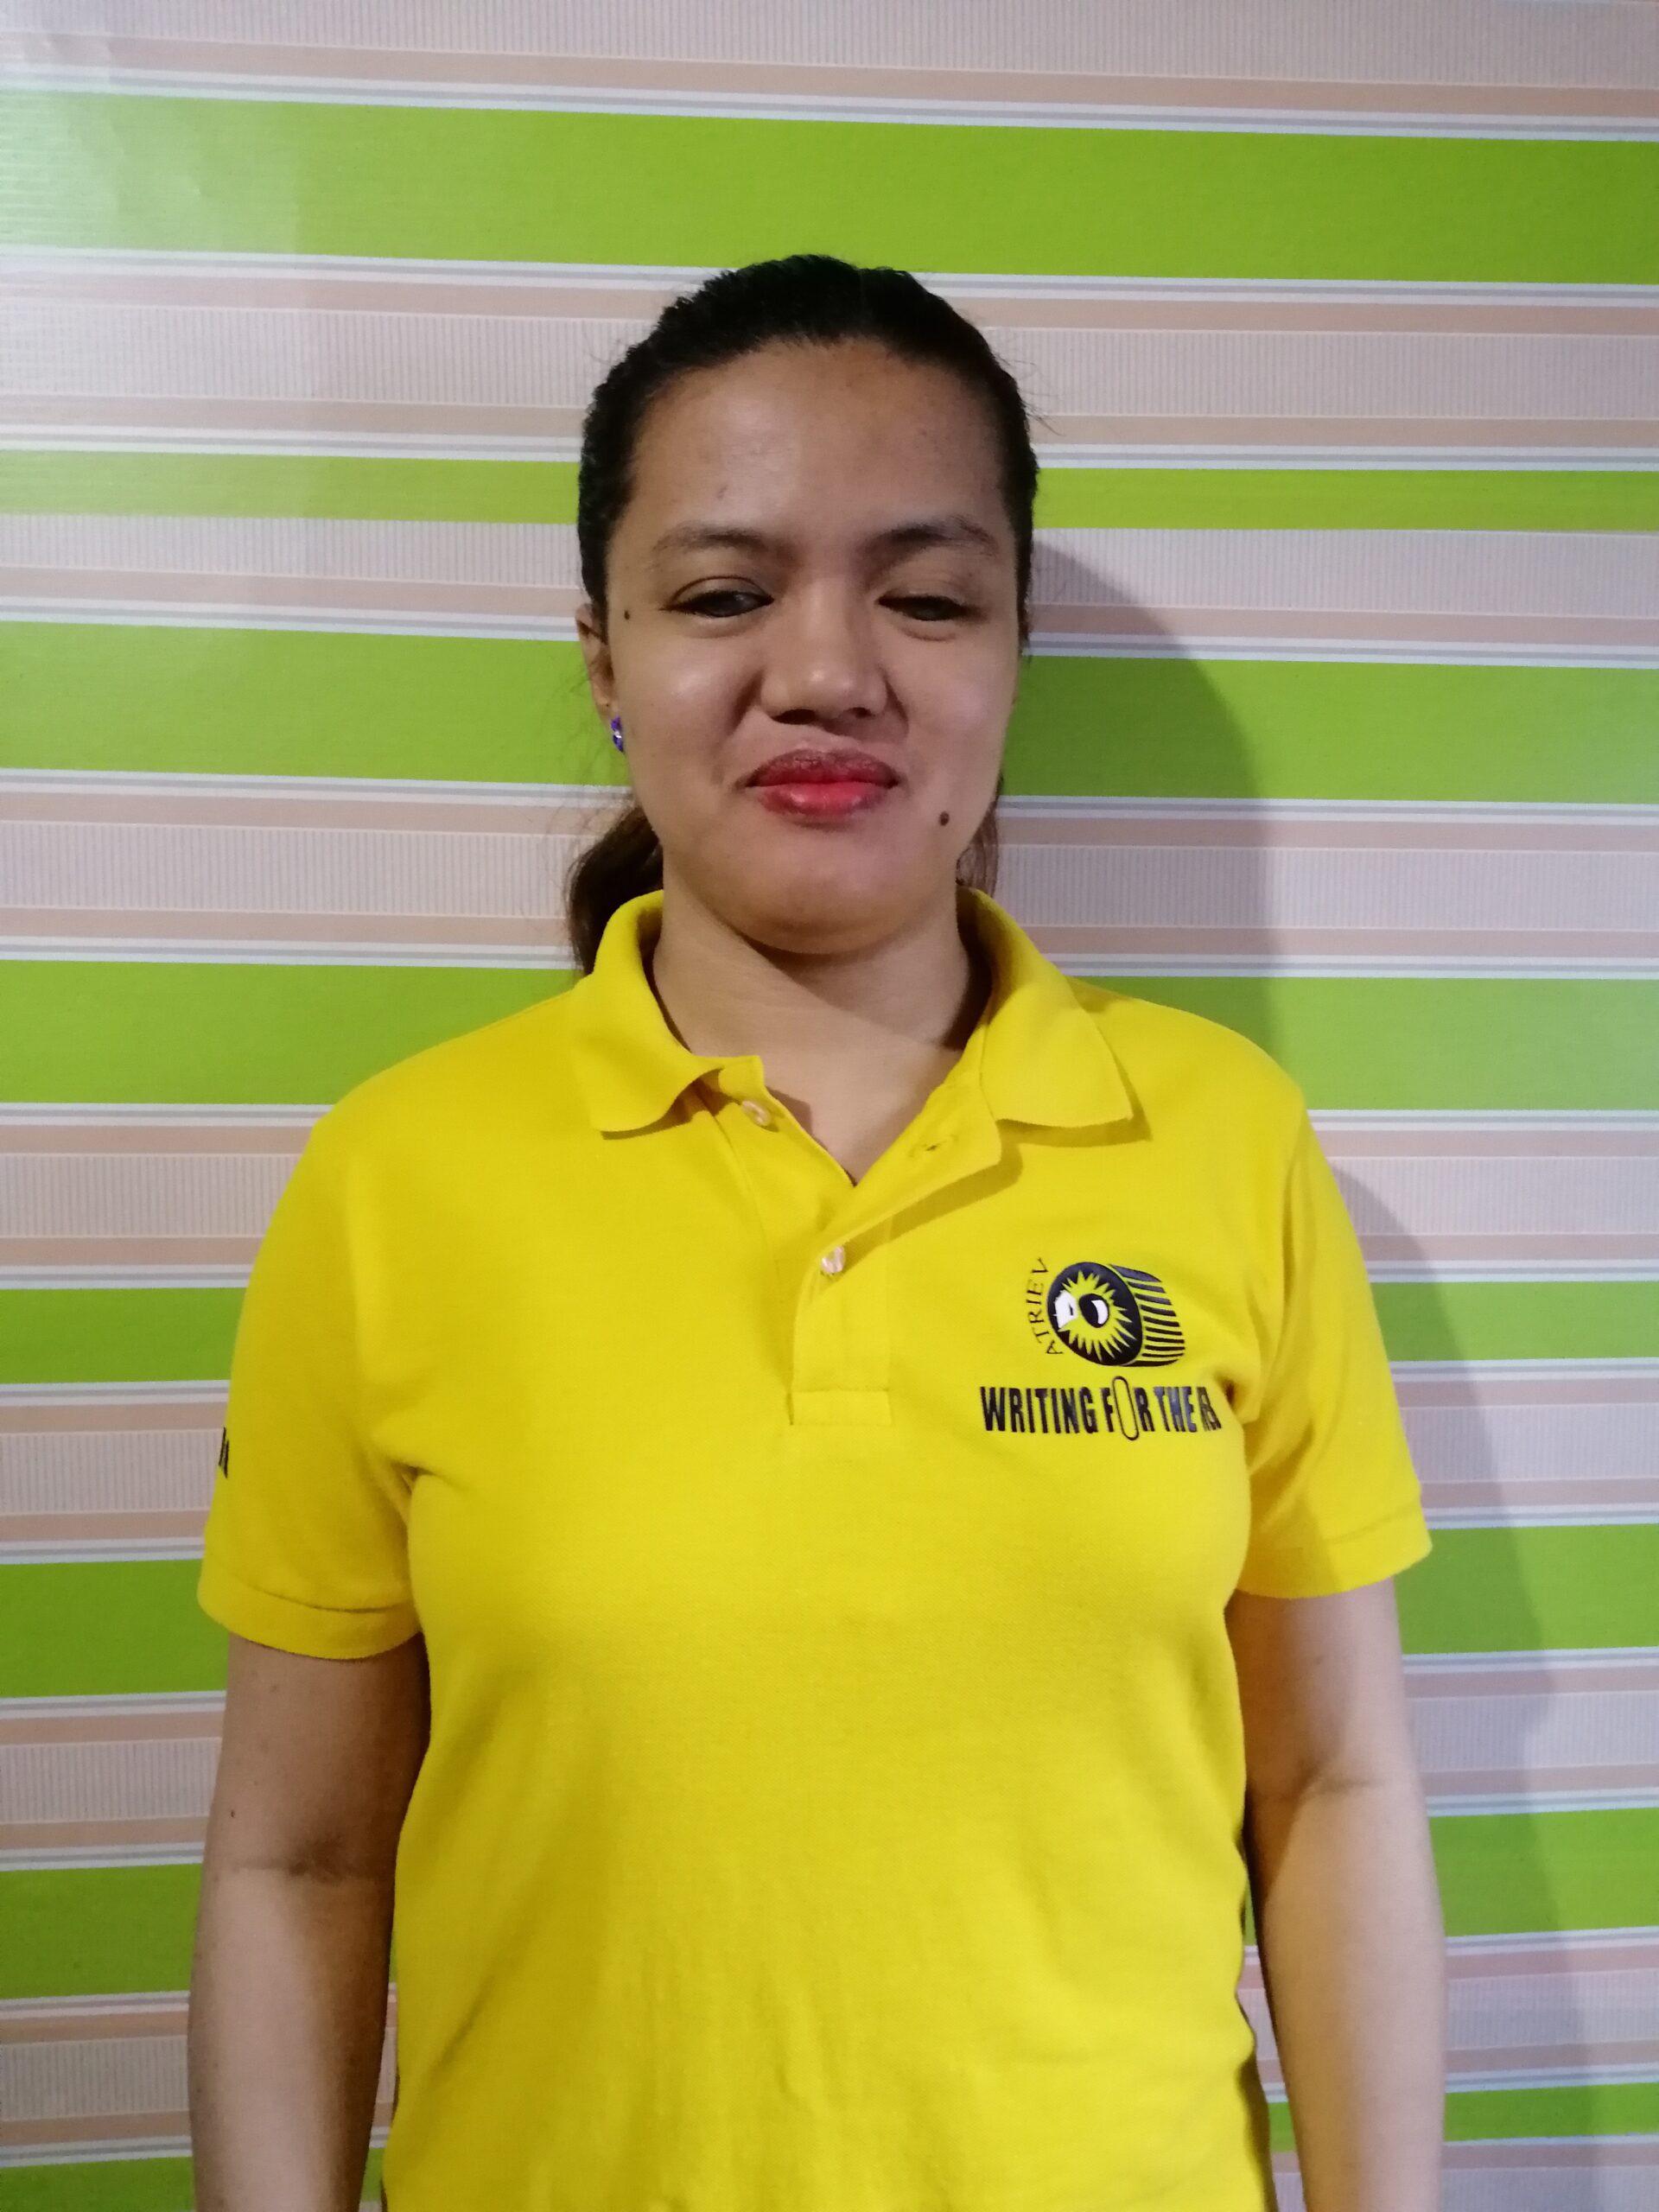 Ms. Jaelene Cristel wearing the ATRIEV yellow shirt